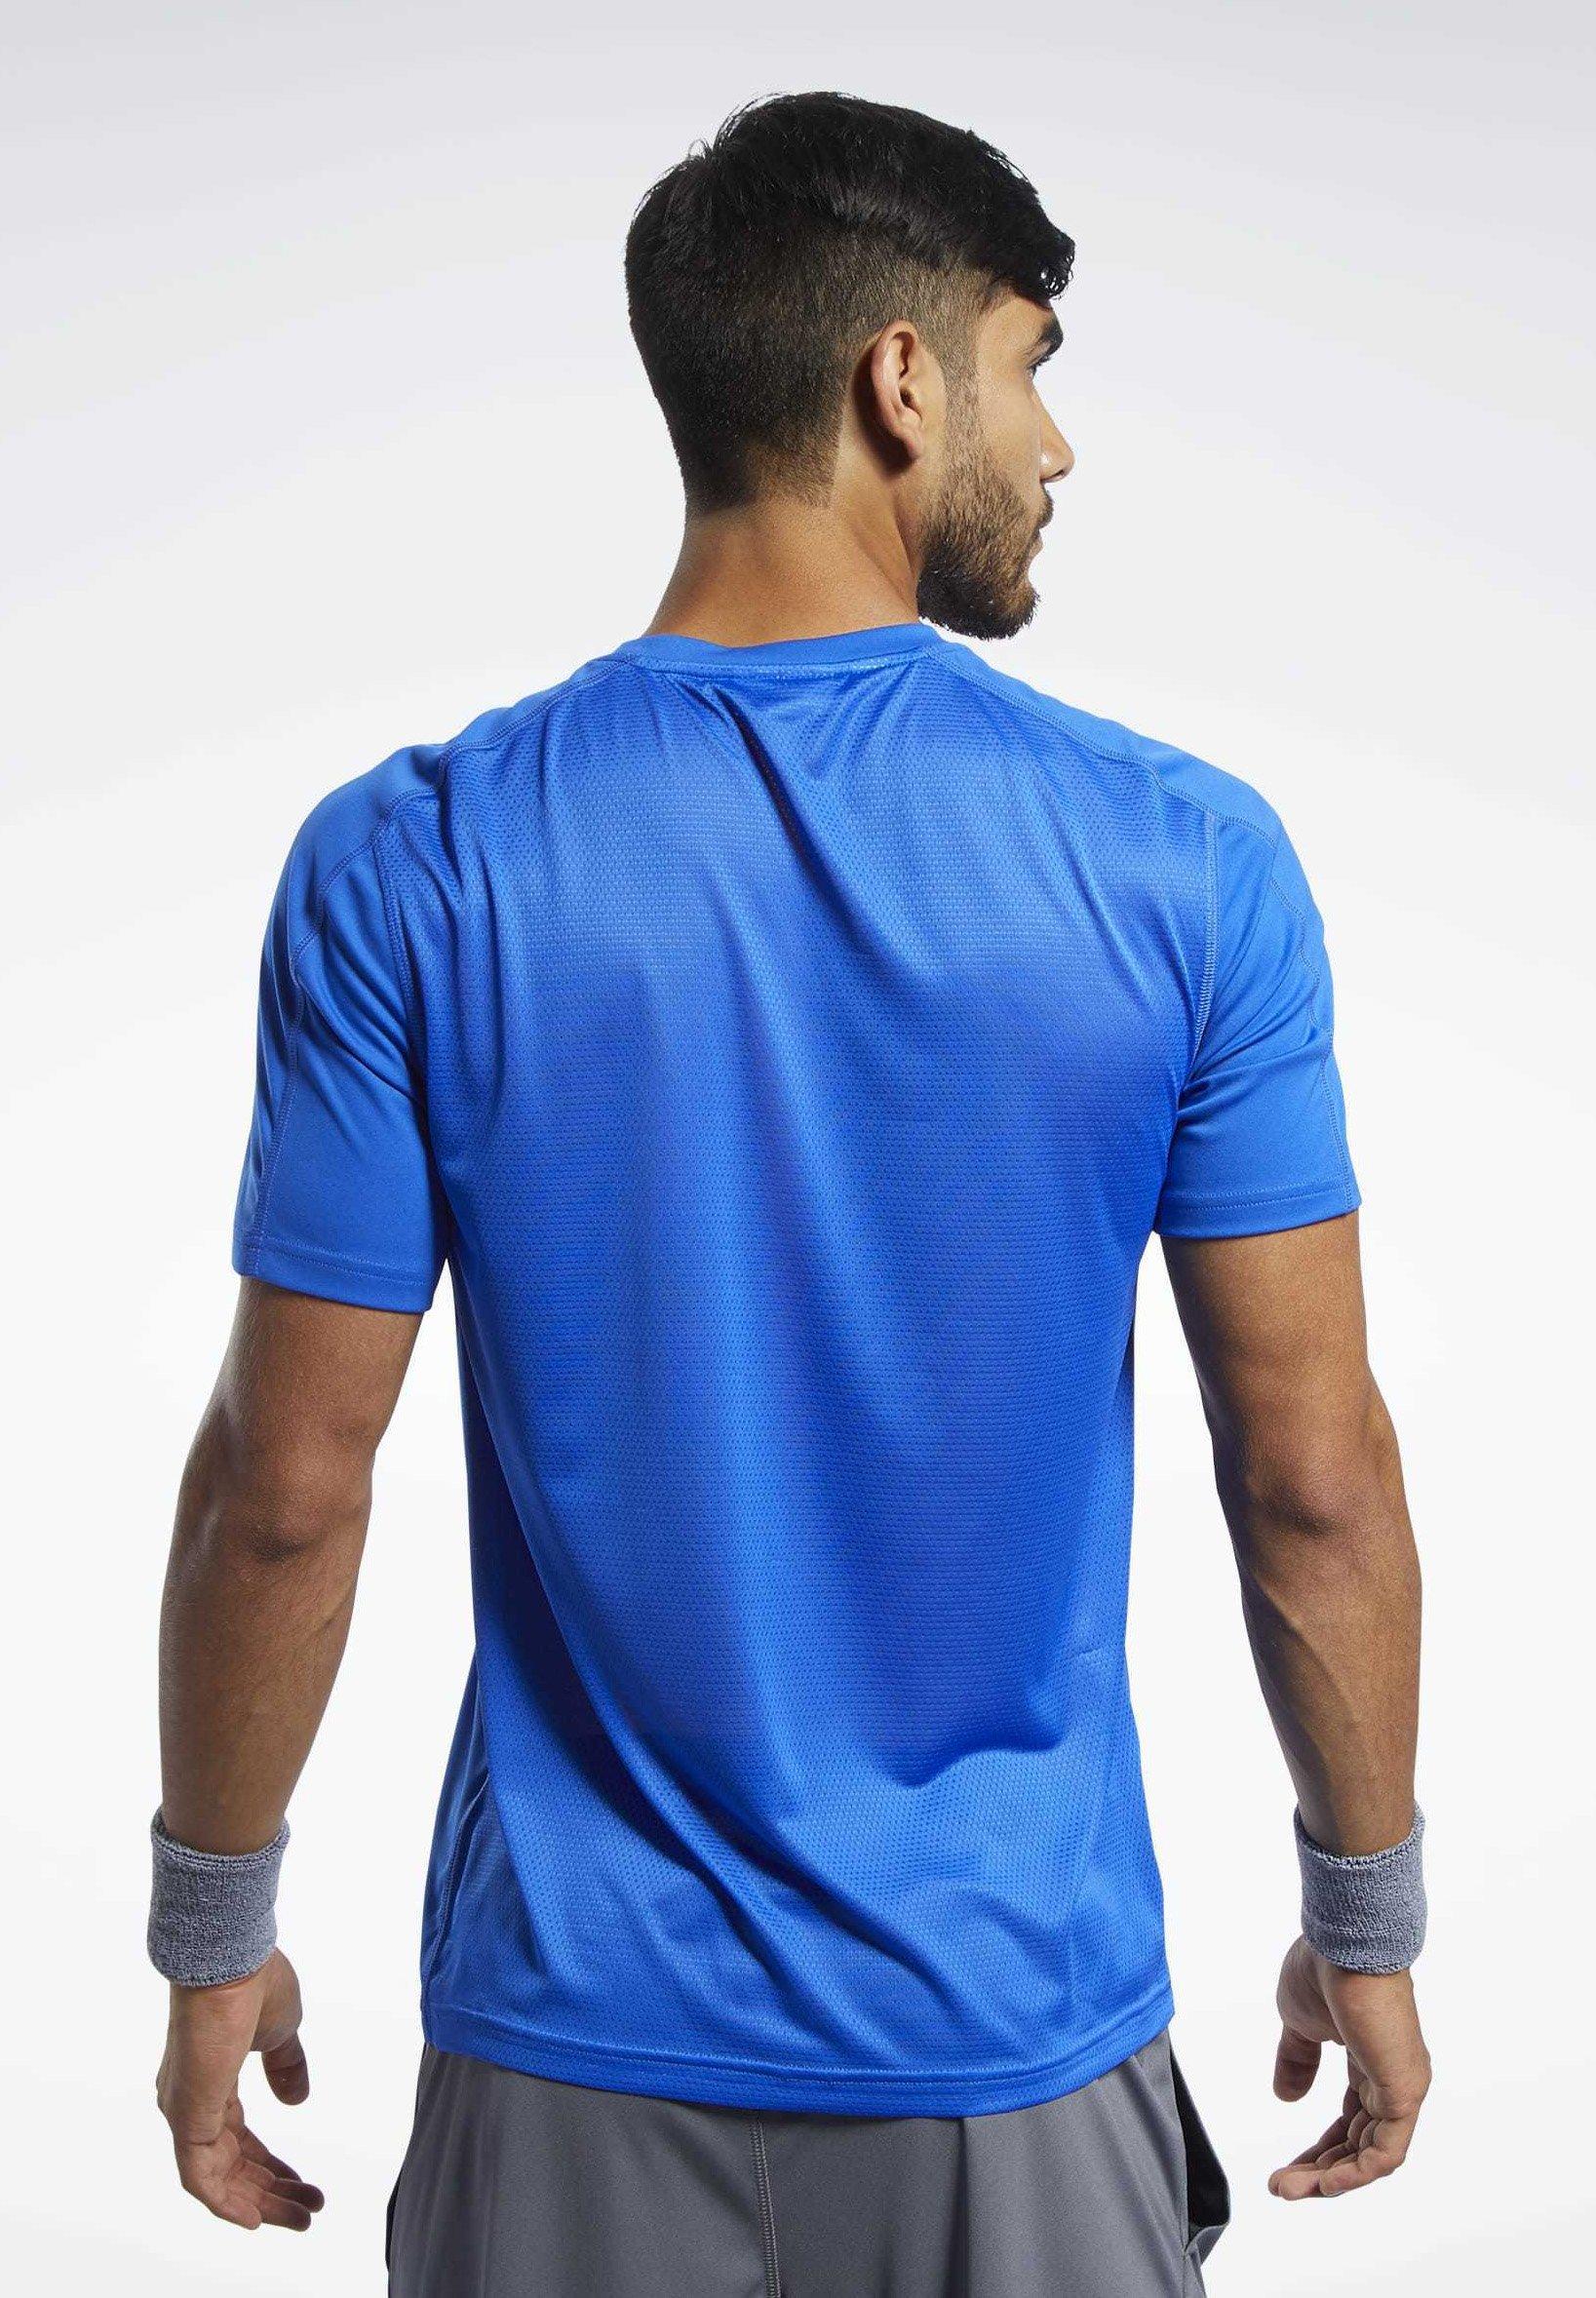 Reebok Workout Ready Polyester Tech Tee - Treningsskjorter Blue/blå